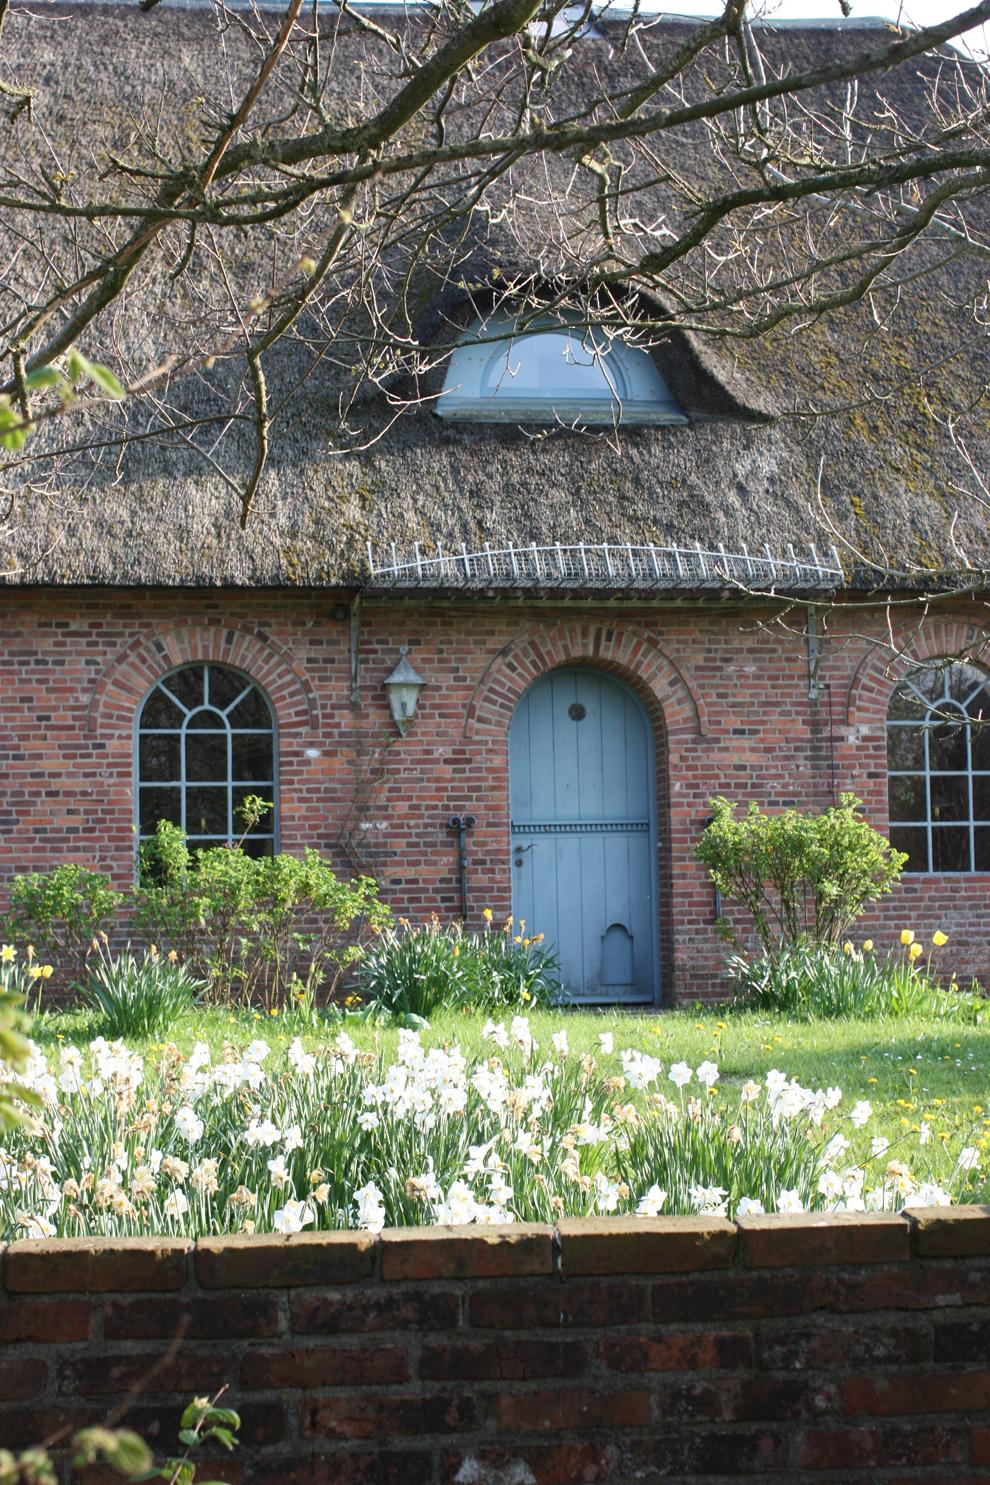 Narzissenfest_Hof_Hilligenbohl_blue_door.jpg